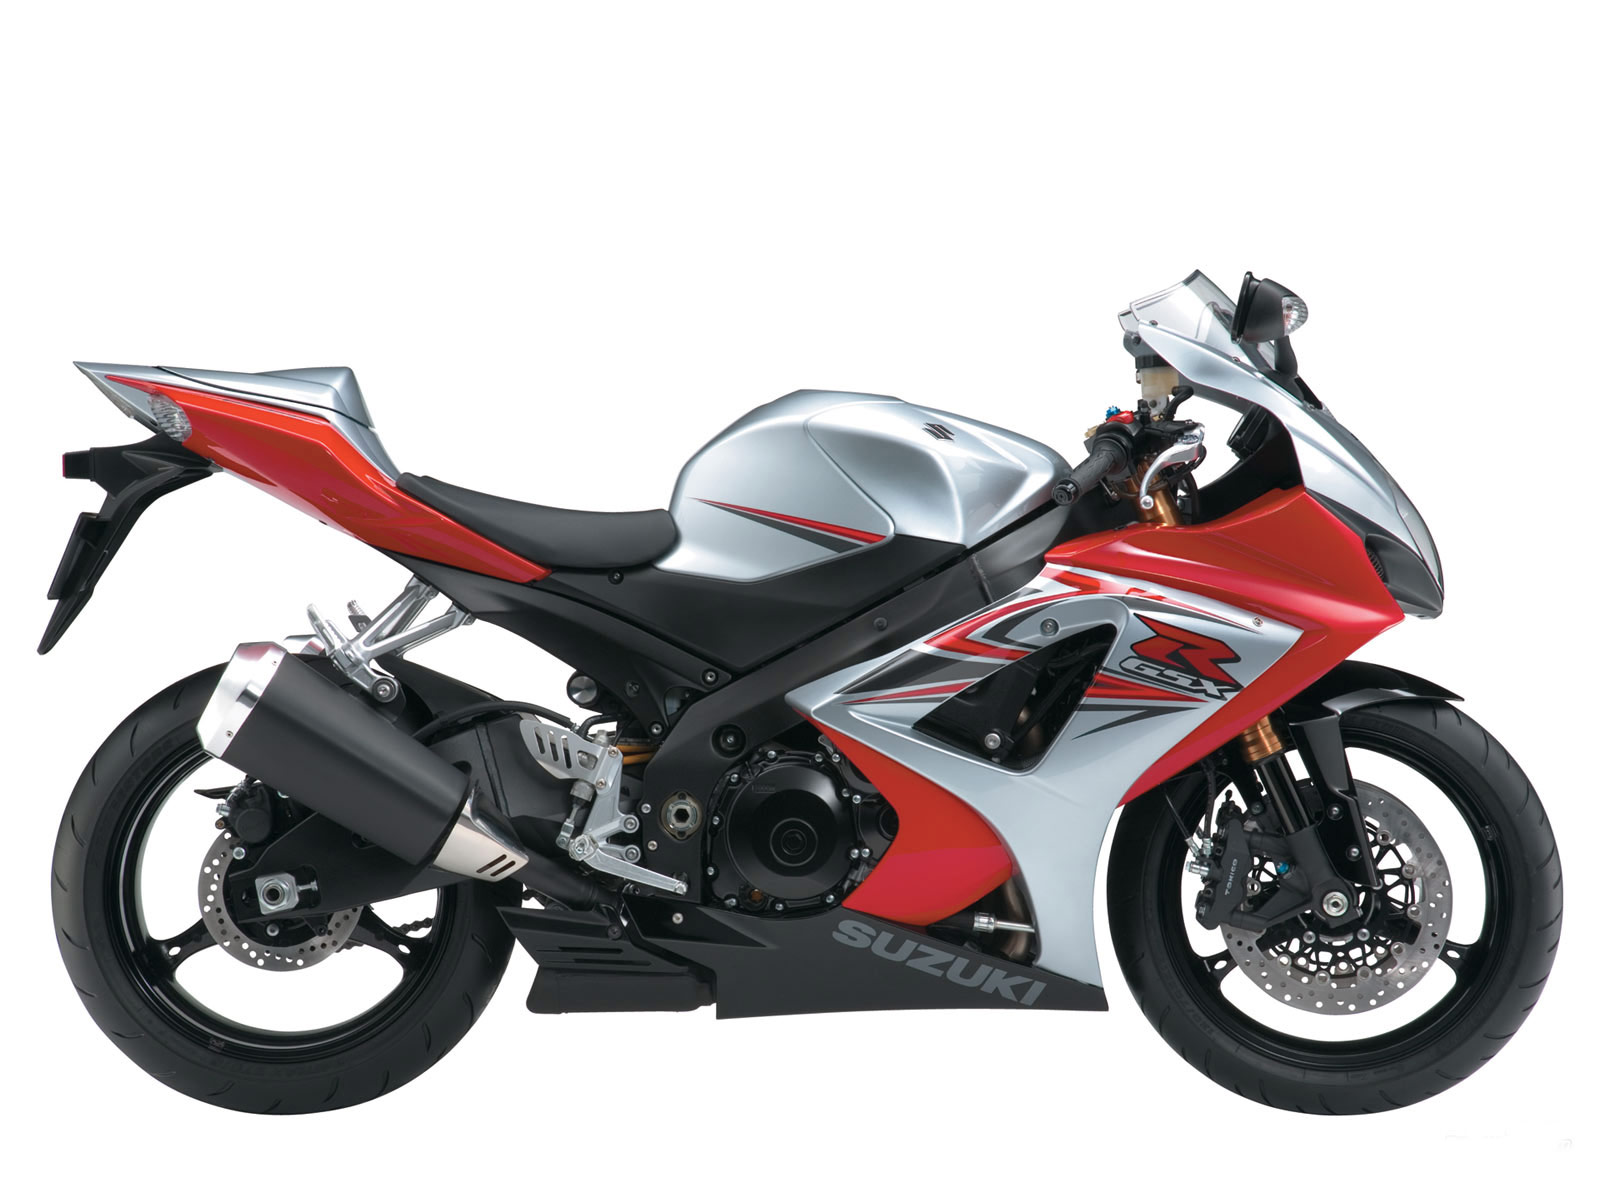 2007 Suzuki Gsx R1000 Accident Lawyers Info